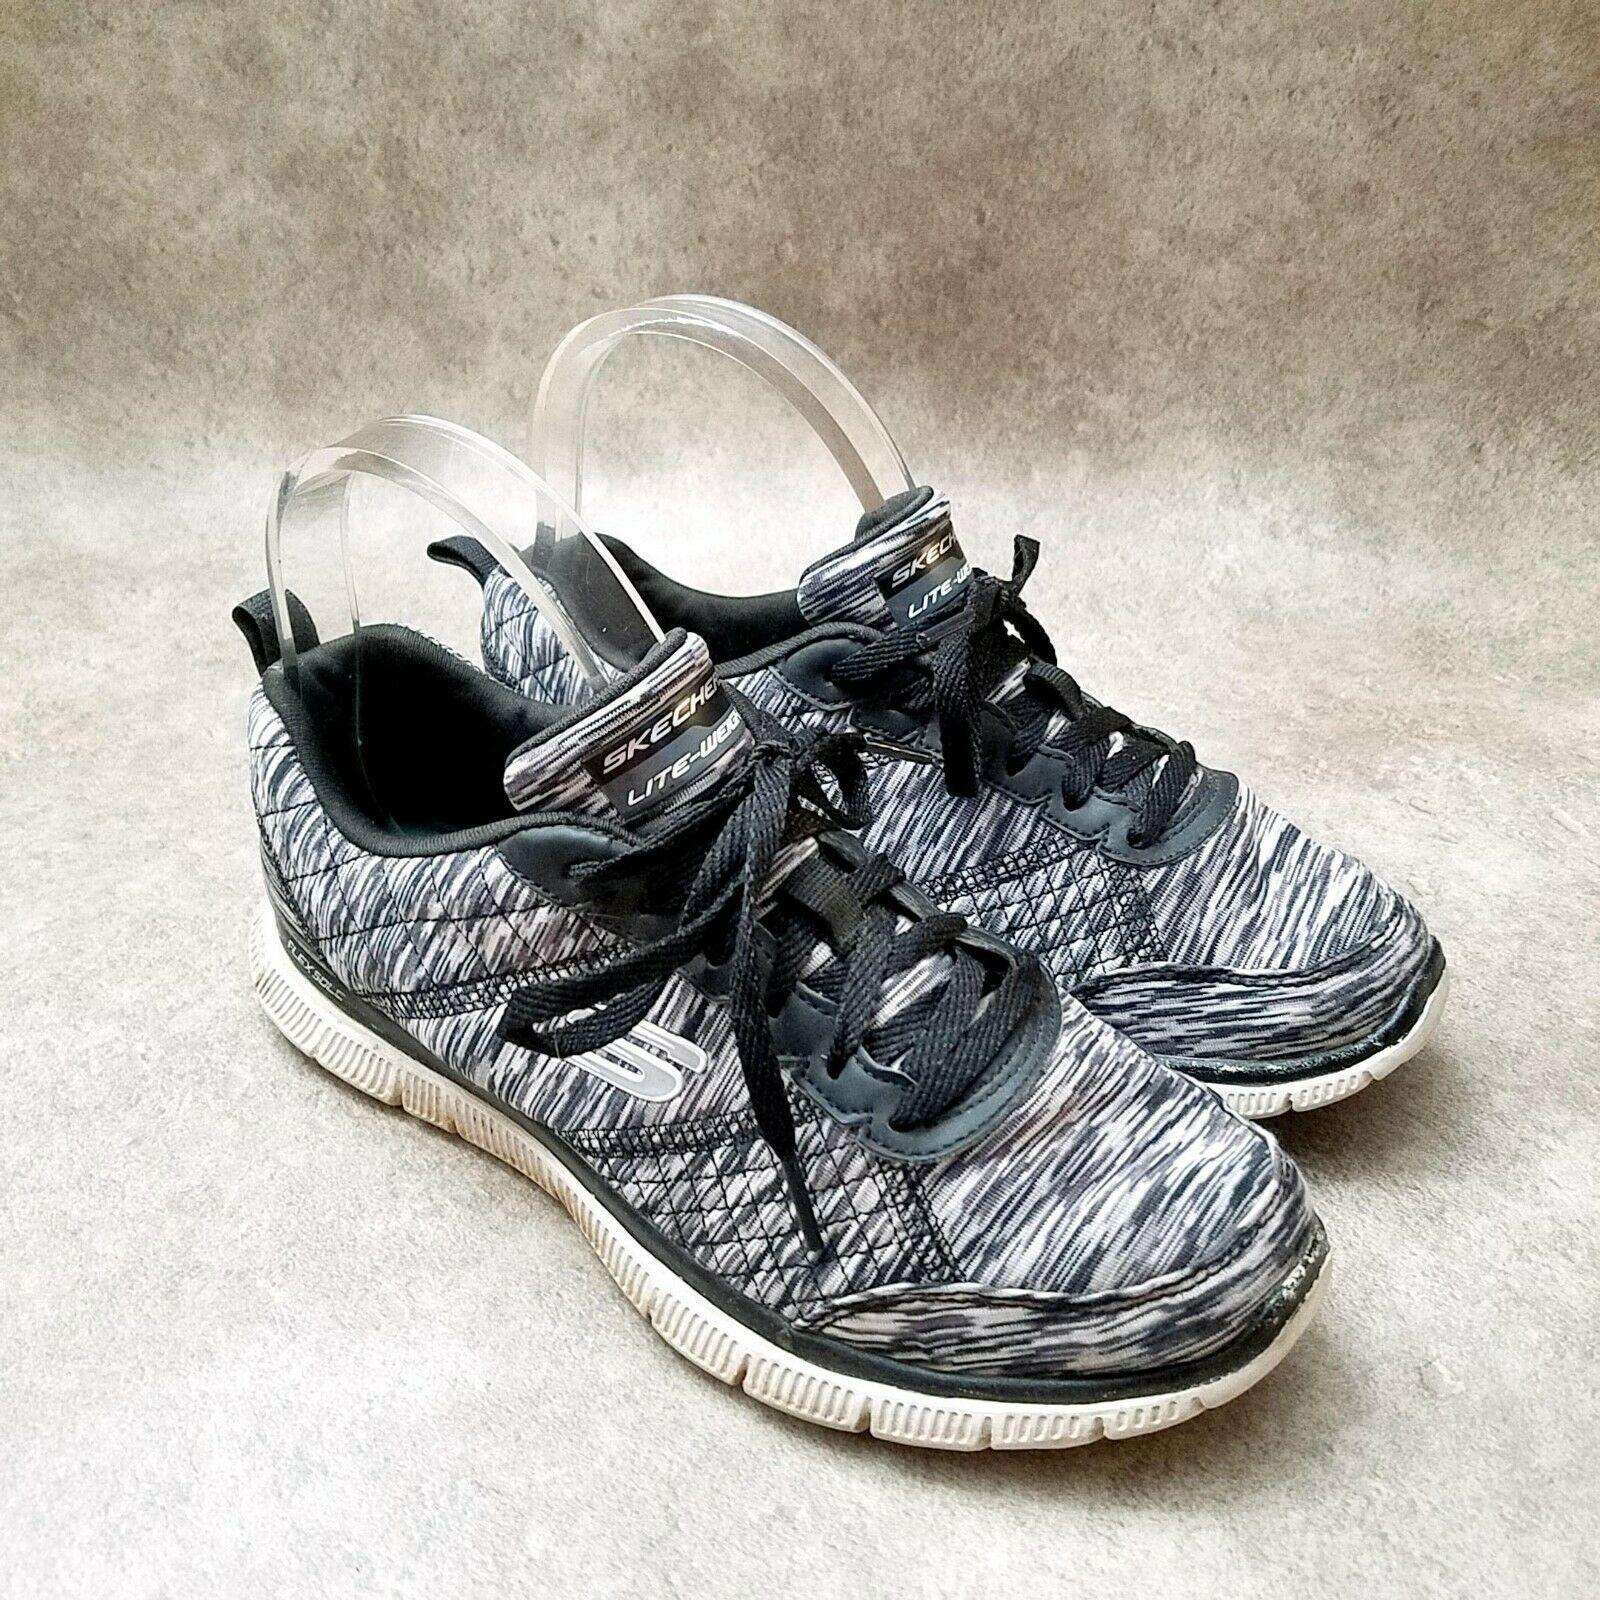 Skechers Womens Lite Walk 12453TX Sz 7 M Black White Running Shoes - $31.99